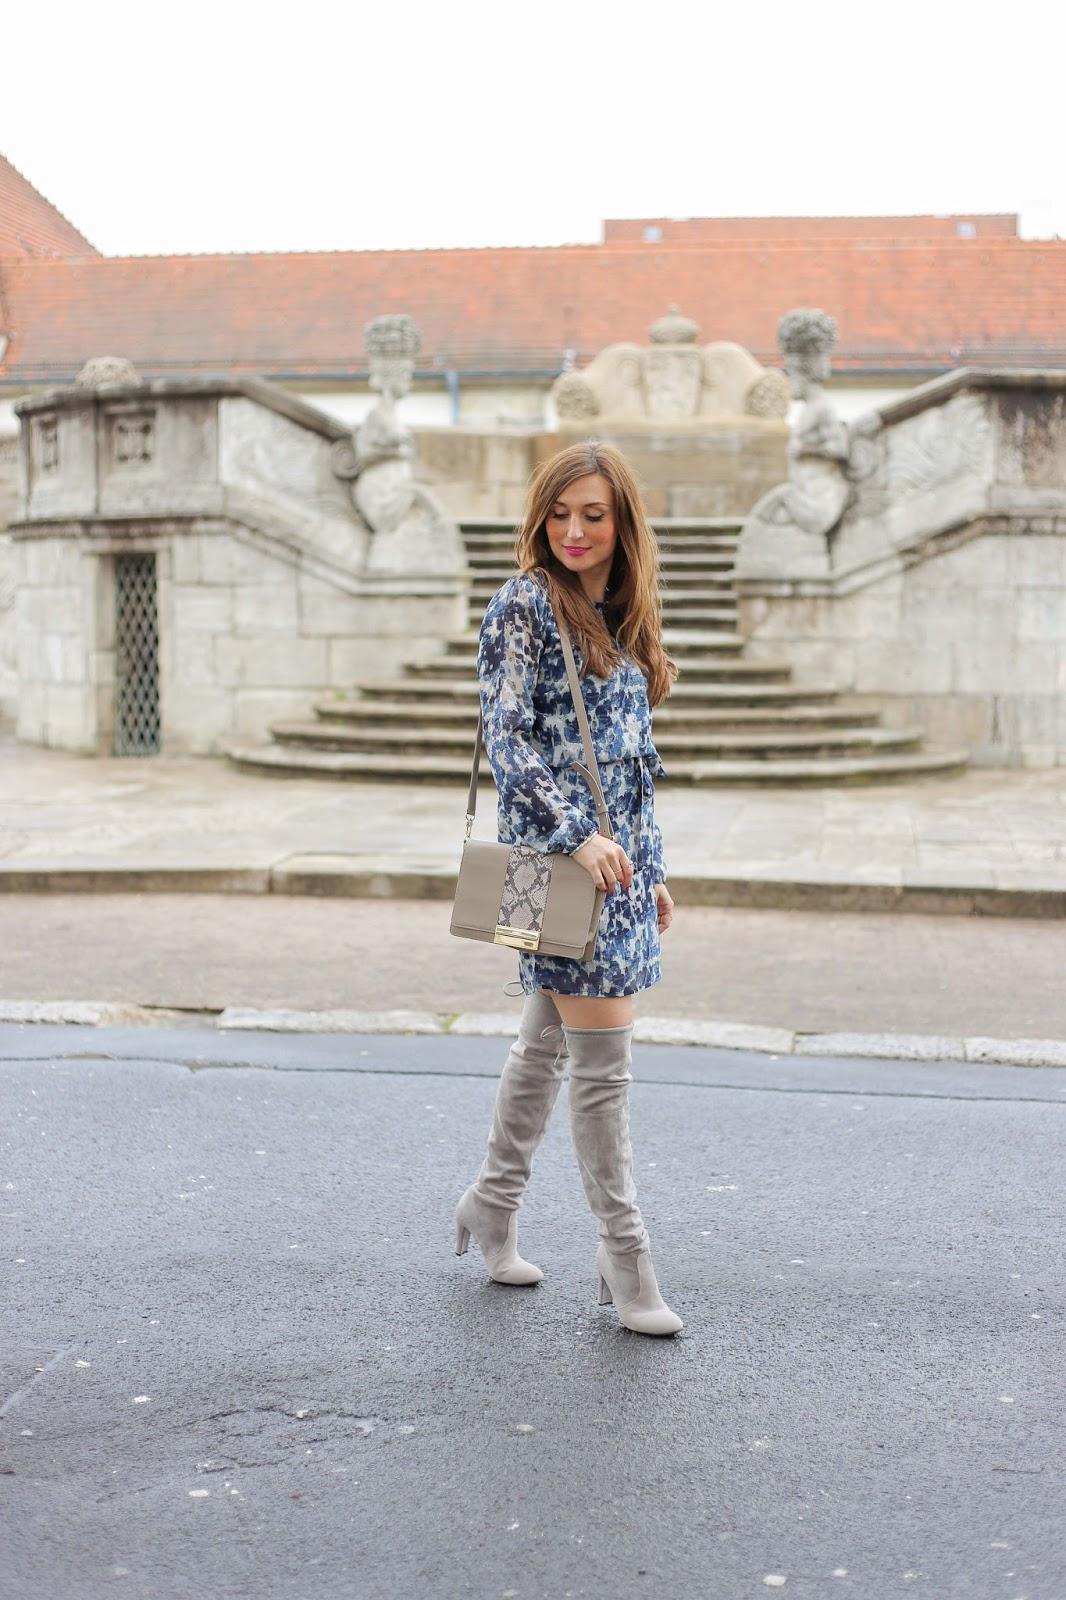 Fashionblogger - Deutsche Fashionblogger StreetOne – Streetone Kleid - Fashionstylebyjohanna - Blogger im Kleid - Streetstyle - Blogger im Karokleid - Fashionblogger aus Deutschland - Deutsche Fashionblogger – Fashionblog – Blogger Streetstylelook - Fashionblogger Frankfurt